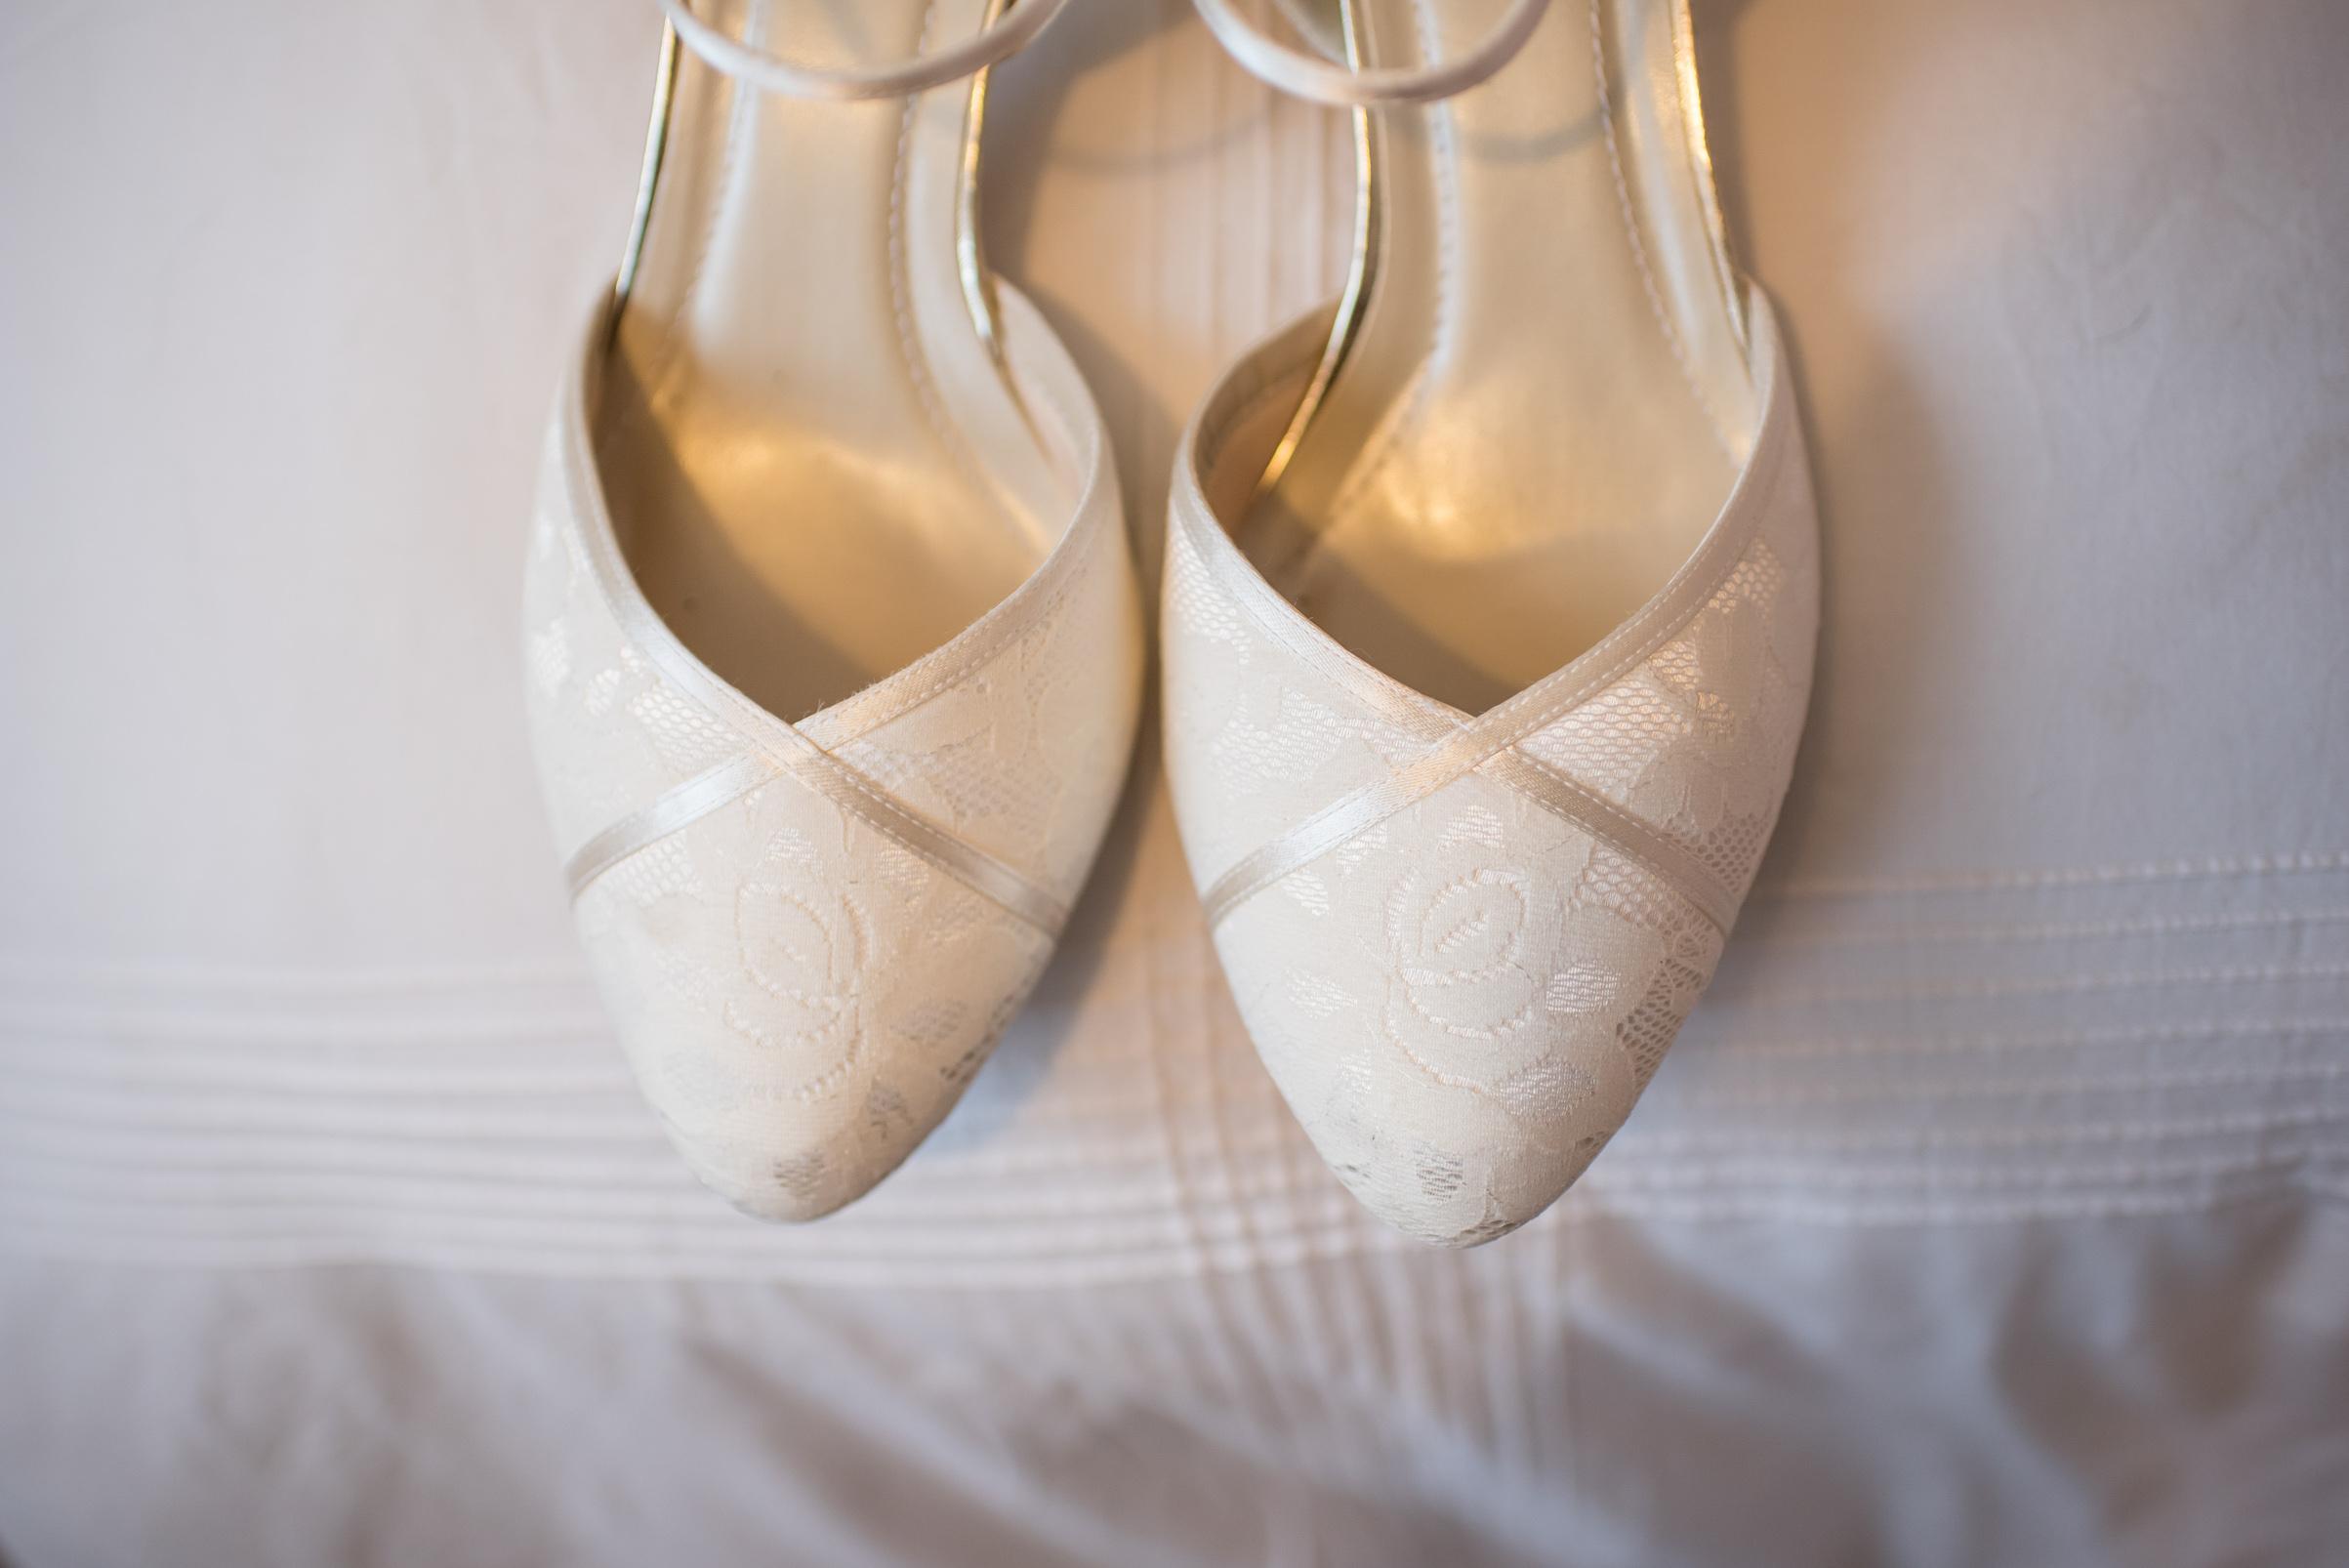 The+Fairlawns+wedding+Aldridge+StLukes+Church-15.jpg